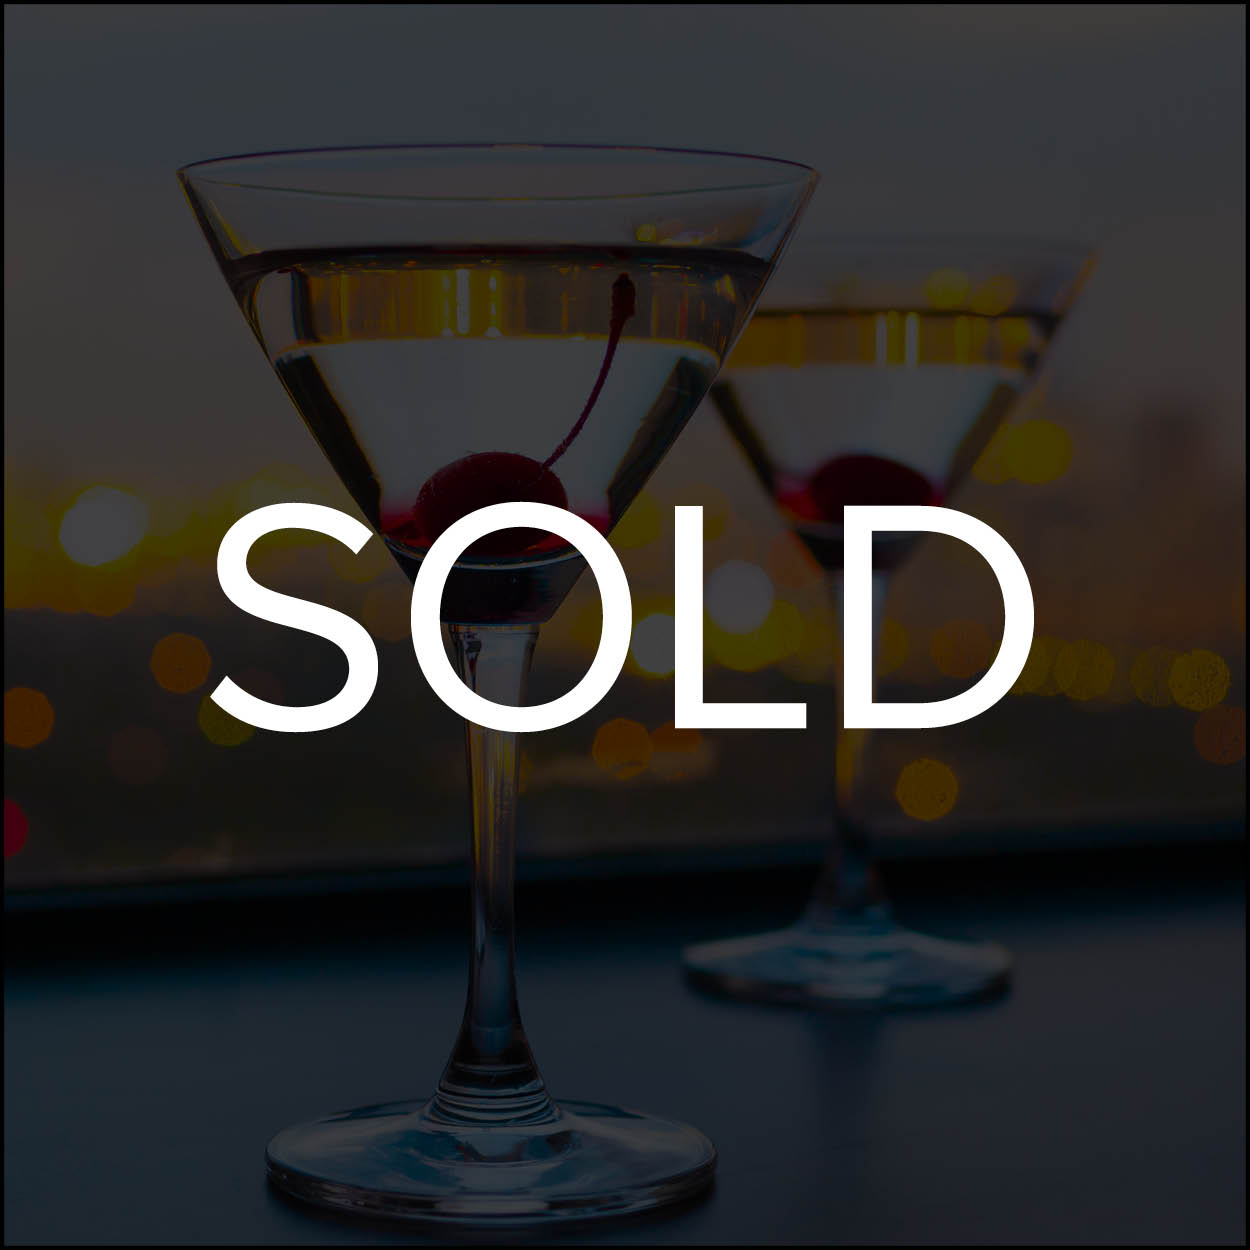 fellowsreception-sold.jpg